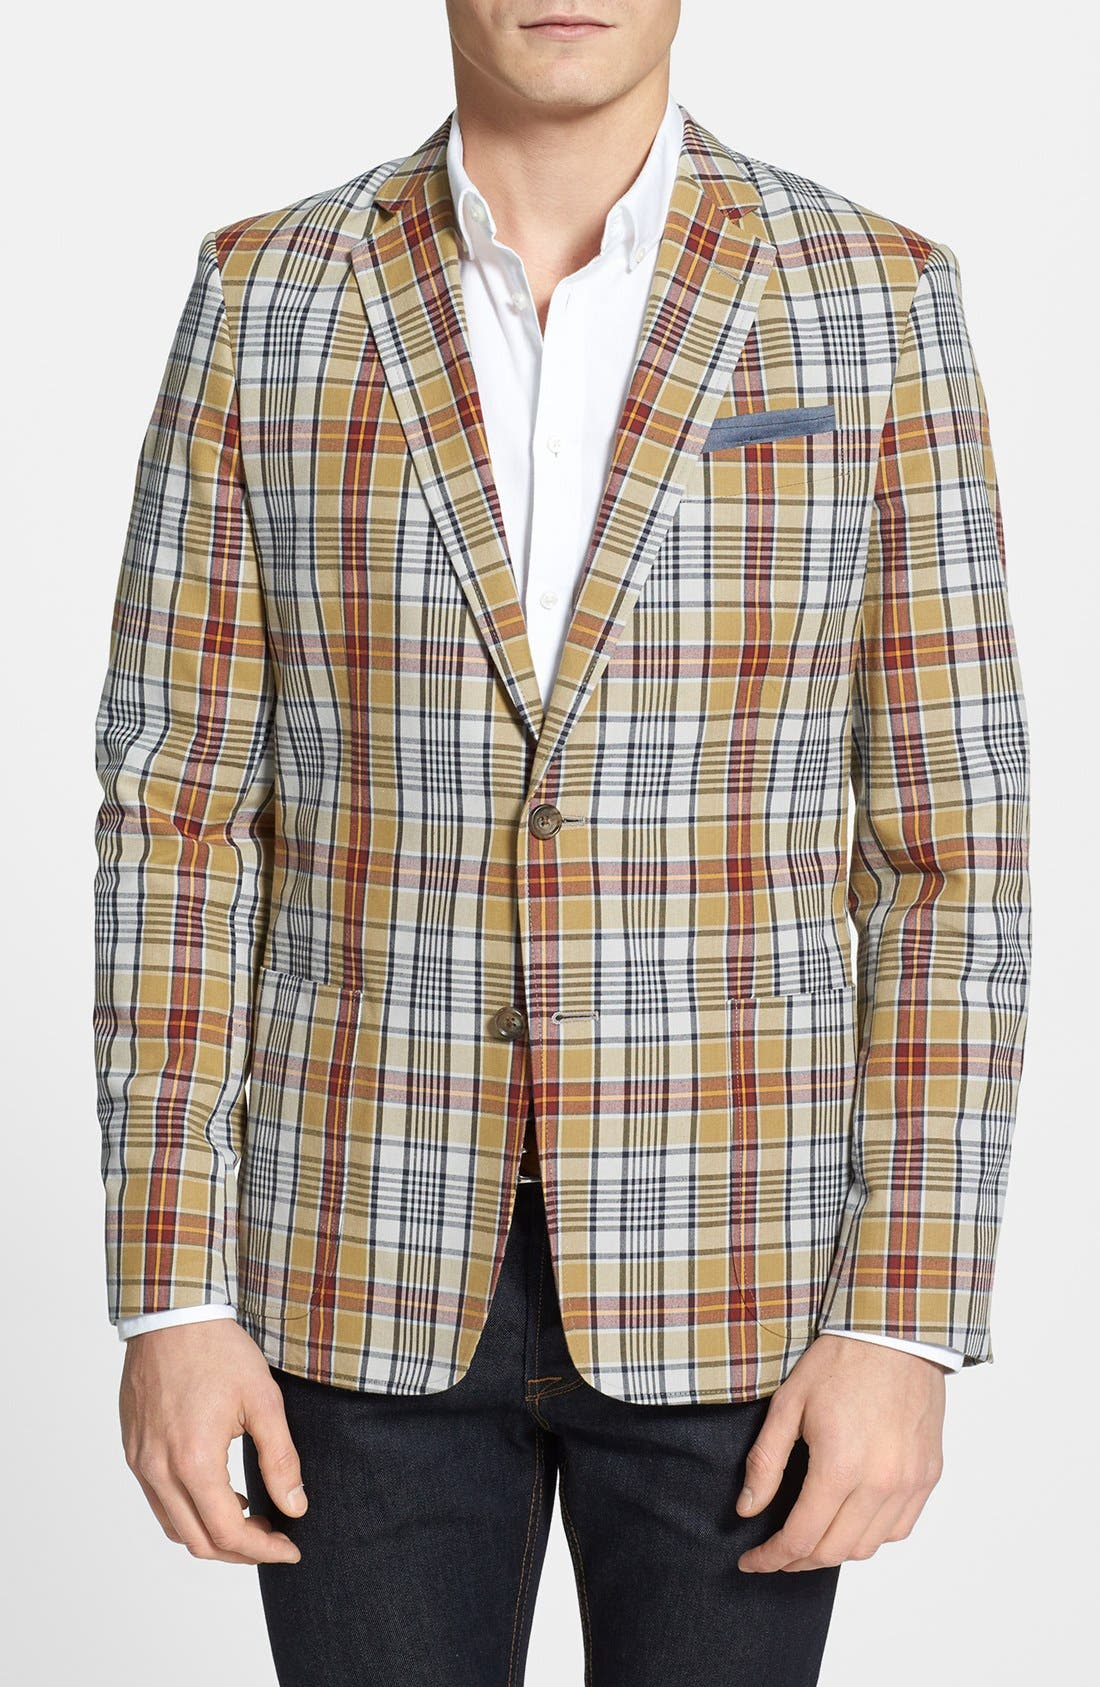 Alternate Image 1 Selected - Wallin & Bros. Trim Fit Madras Plaid Sportcoat